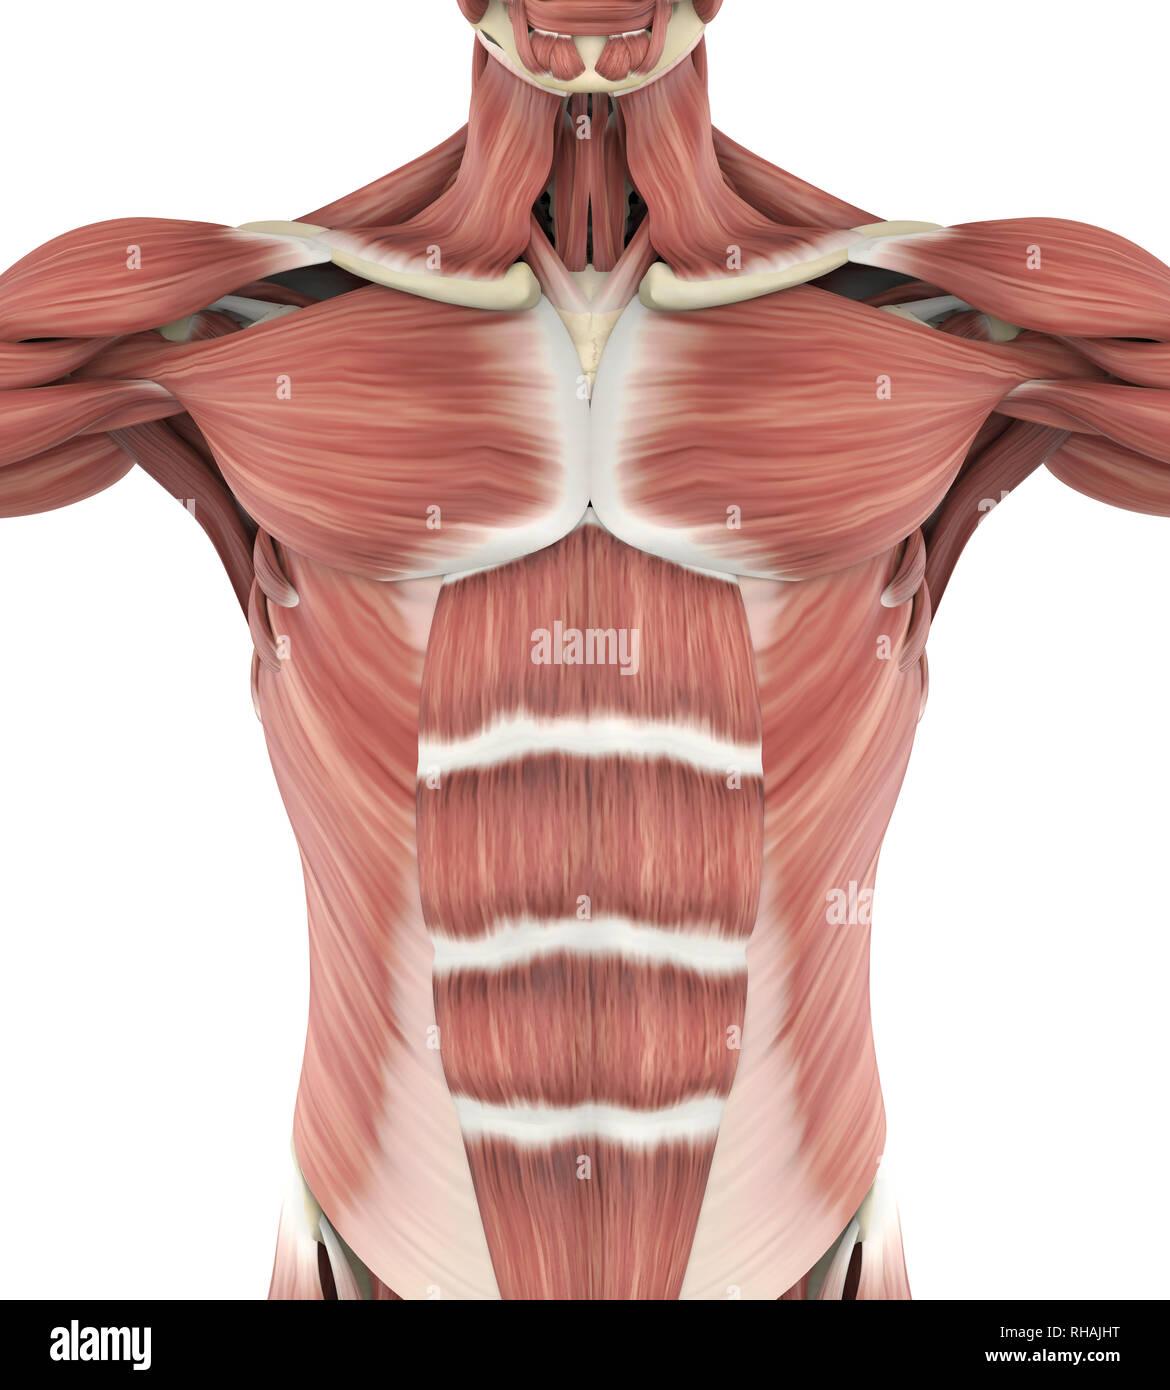 upper anterior muscles anatomy - stock image